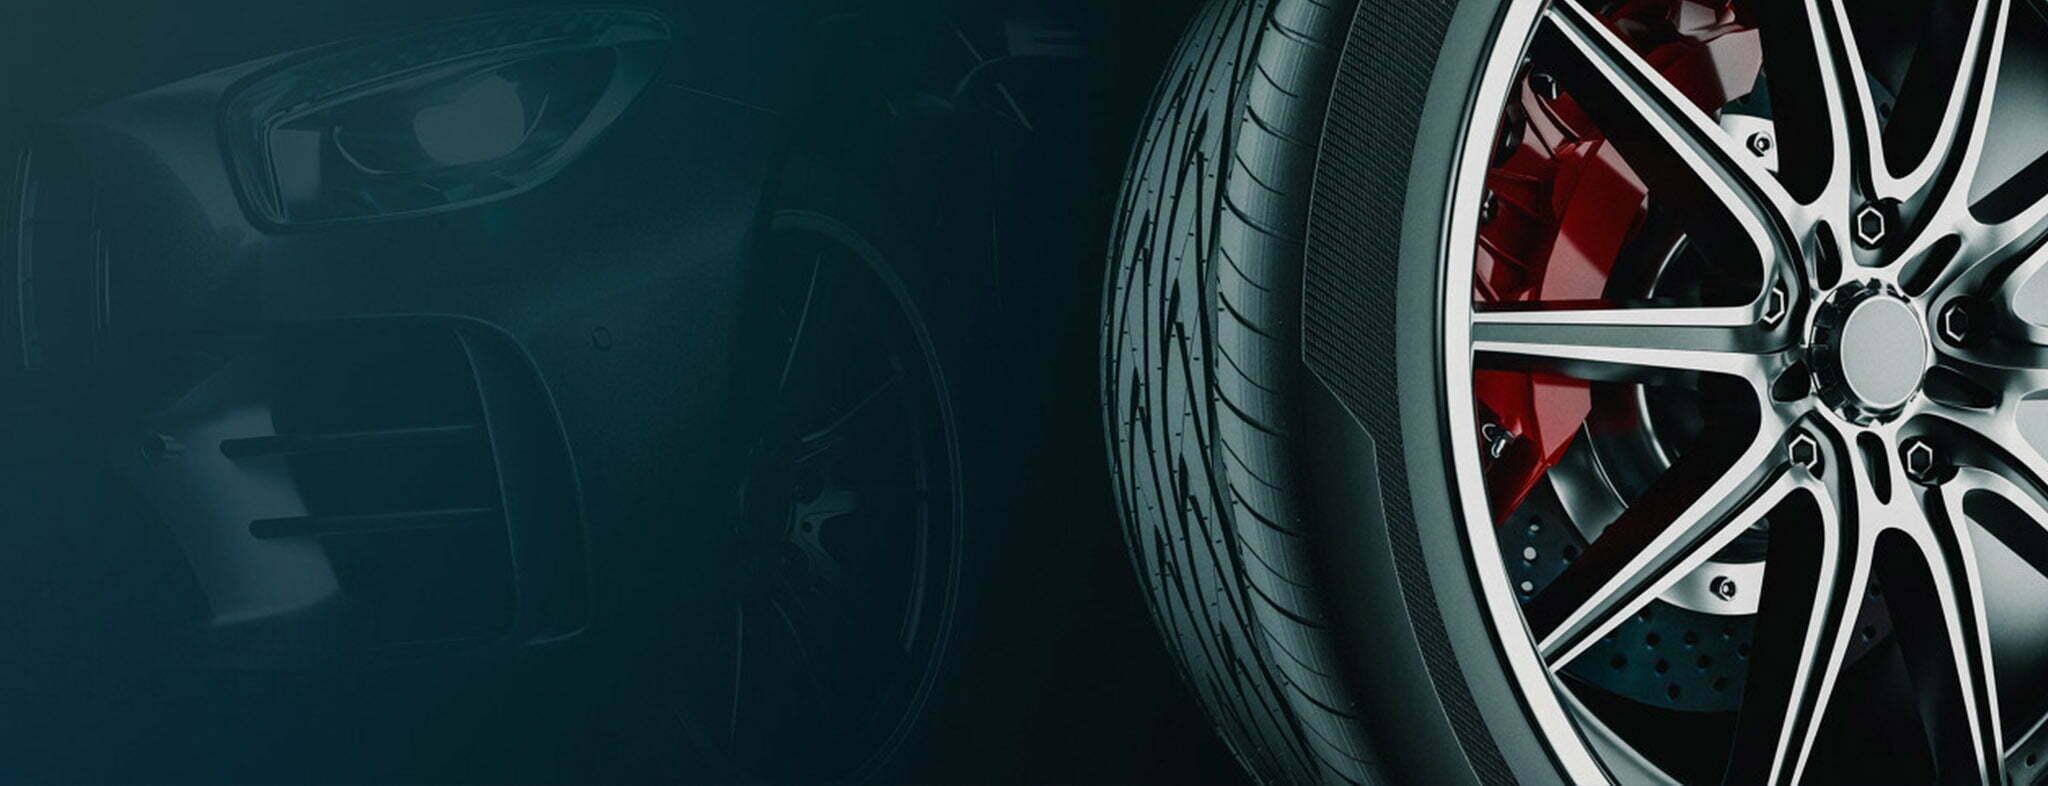 machined alloy wheel repair servcie